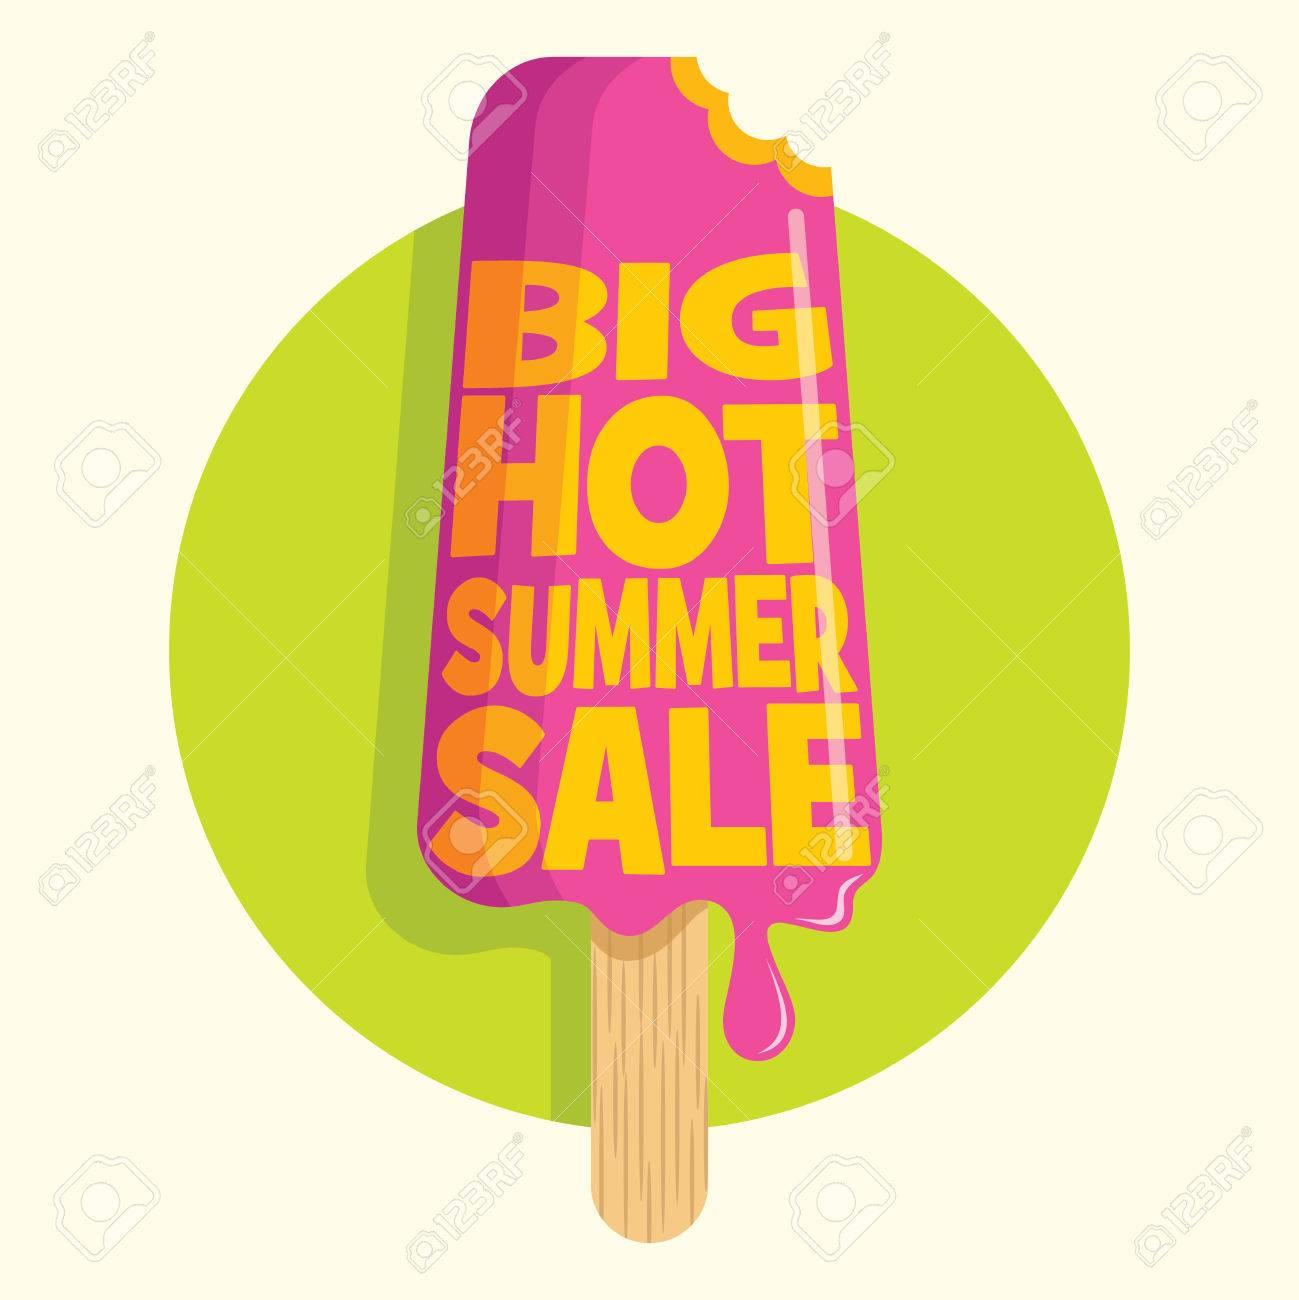 Summer sale design template - 39942911